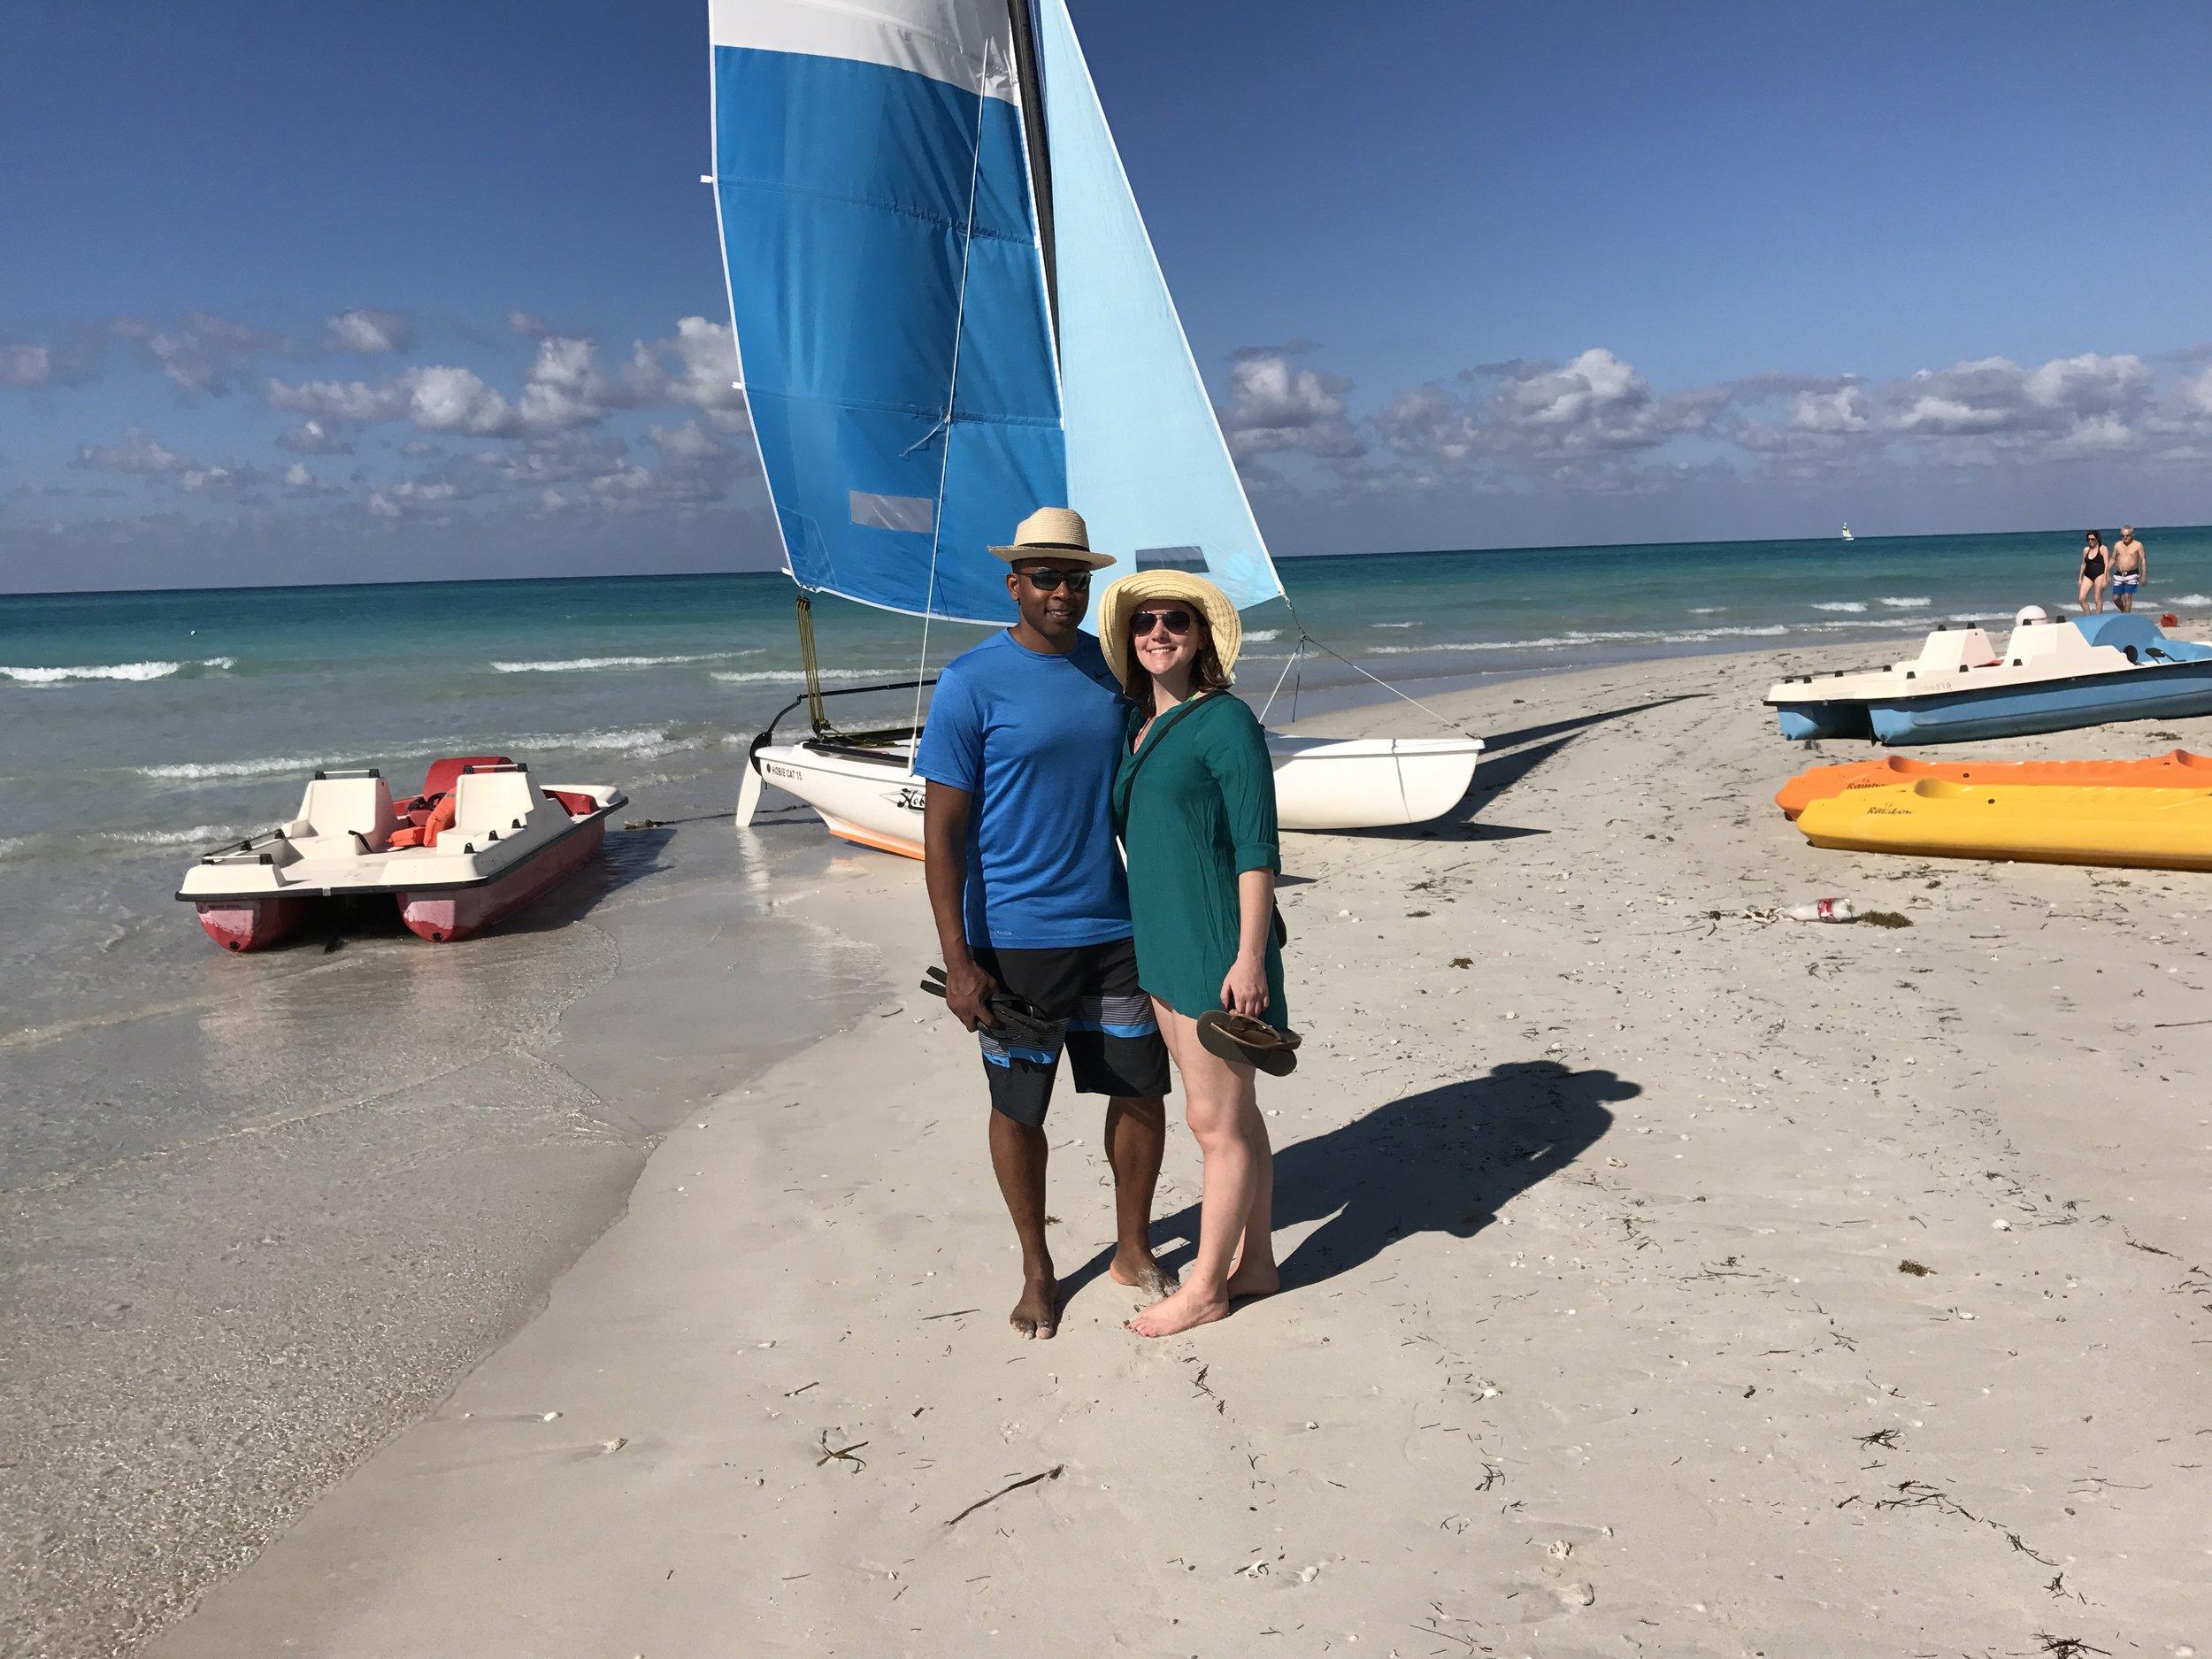 Sami & Chris on the beach in Varadero.